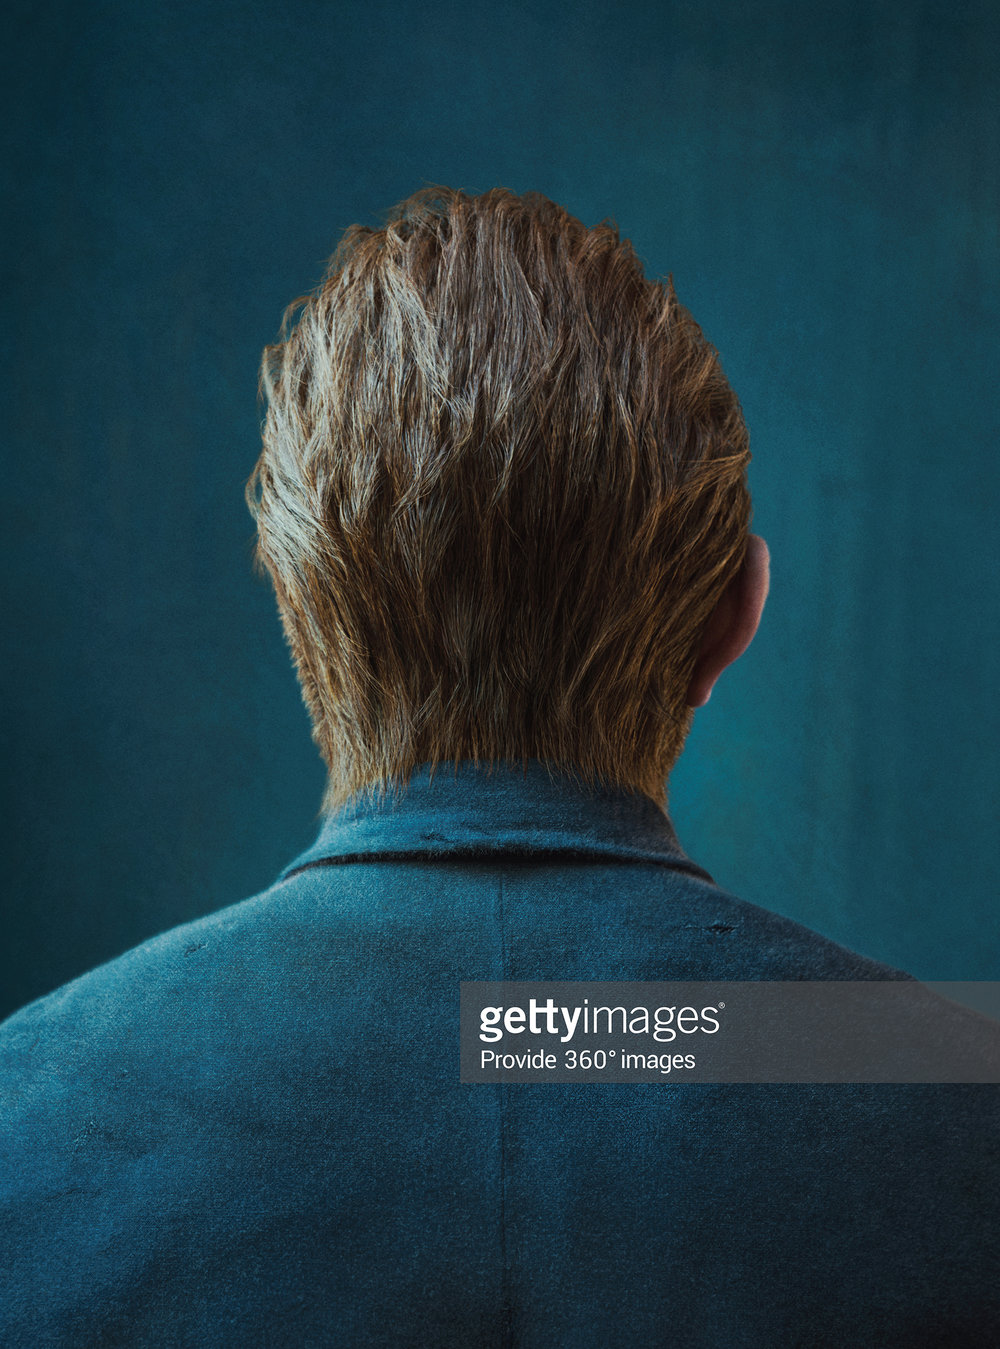 BACK-Van Gogh_Srgb.jpg